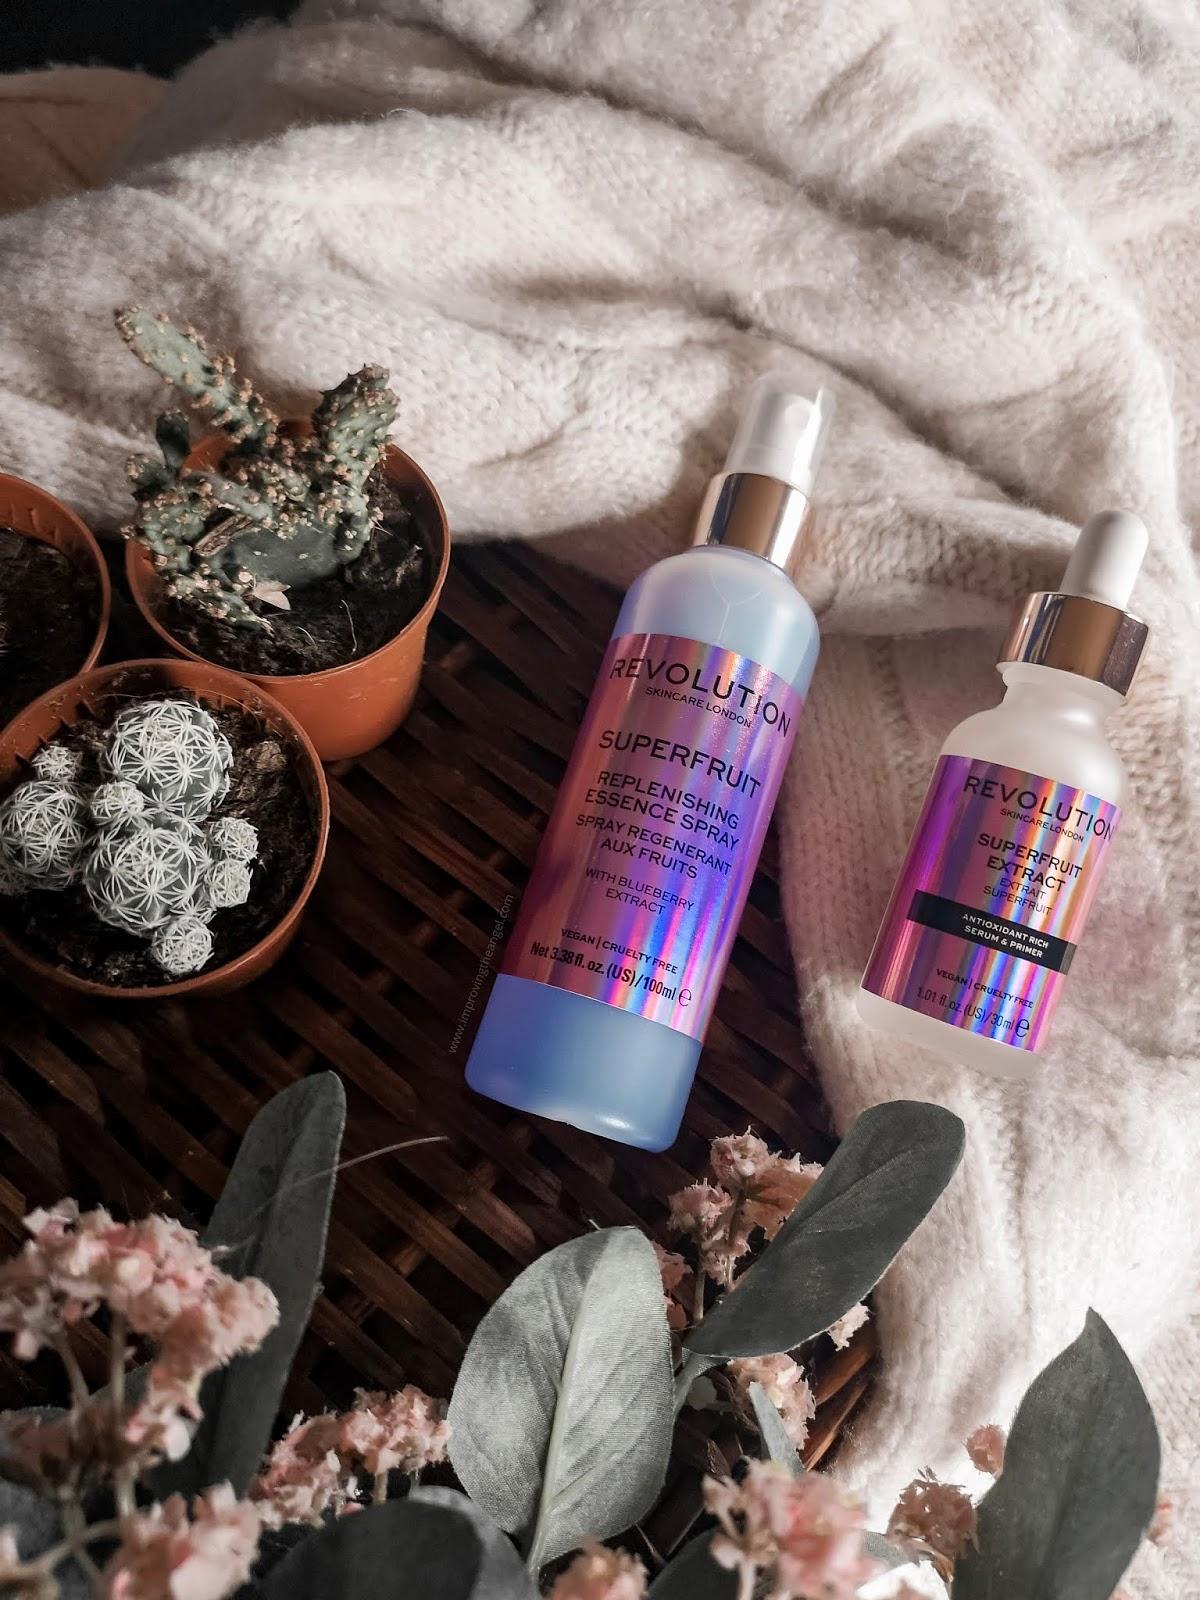 Spray hidratante y serum Superfruit Revolution Skincare